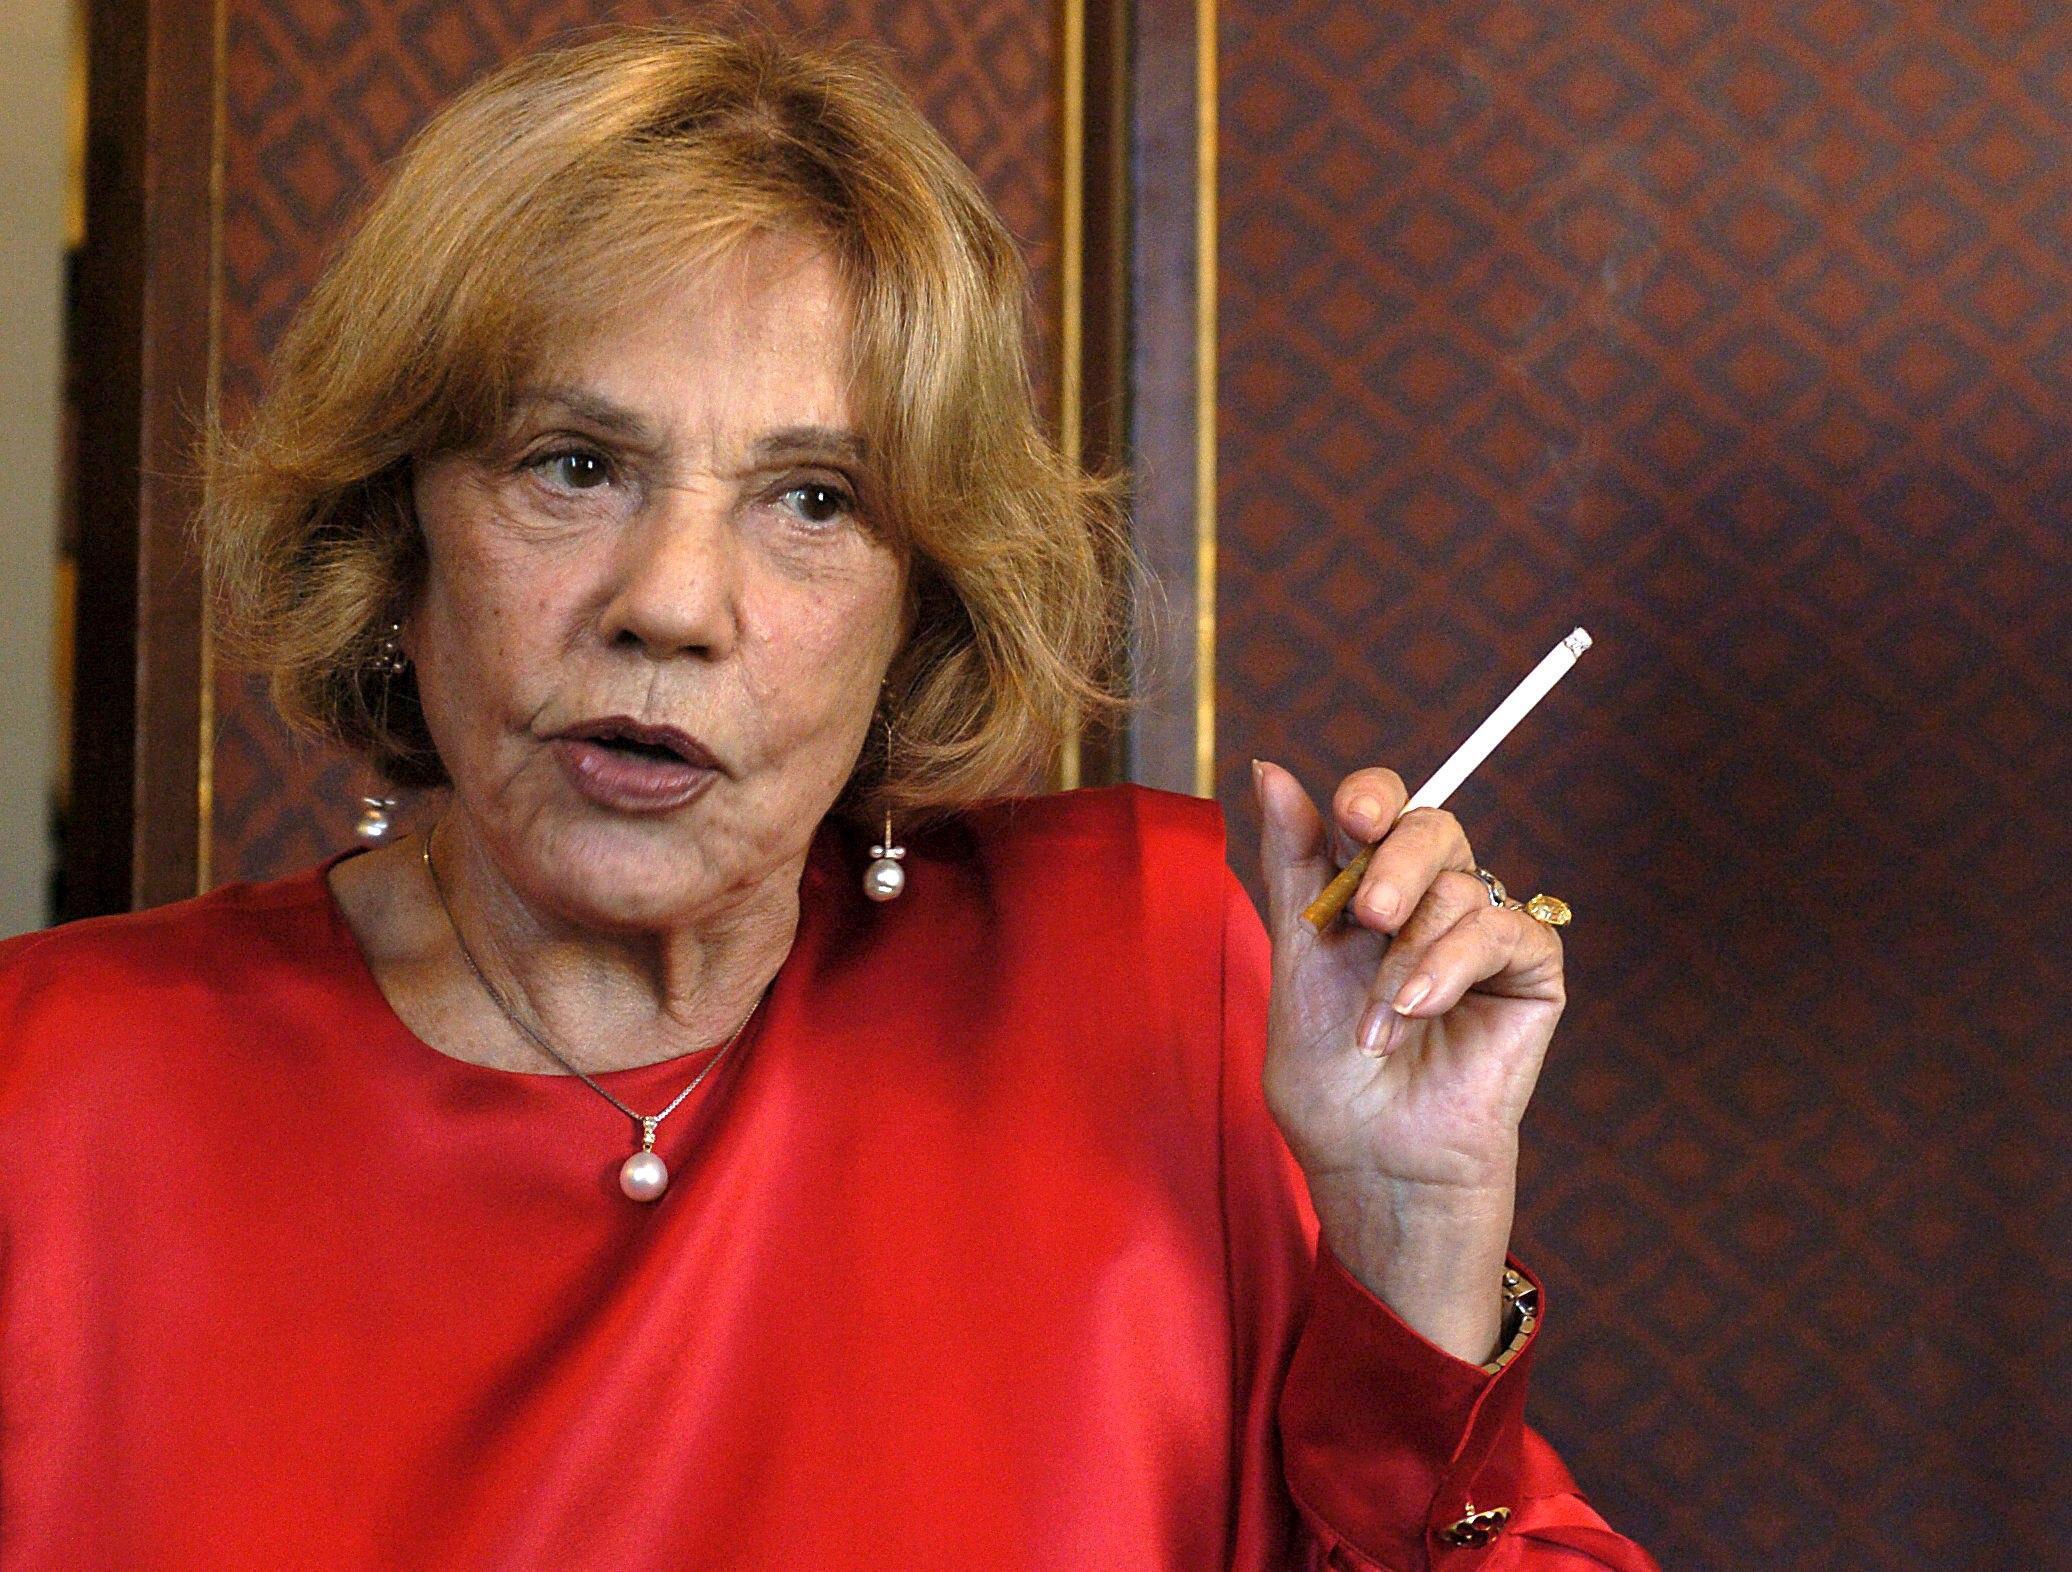 Morta Jeanne Moreau, icona del cinema francese: aveva 89 anni